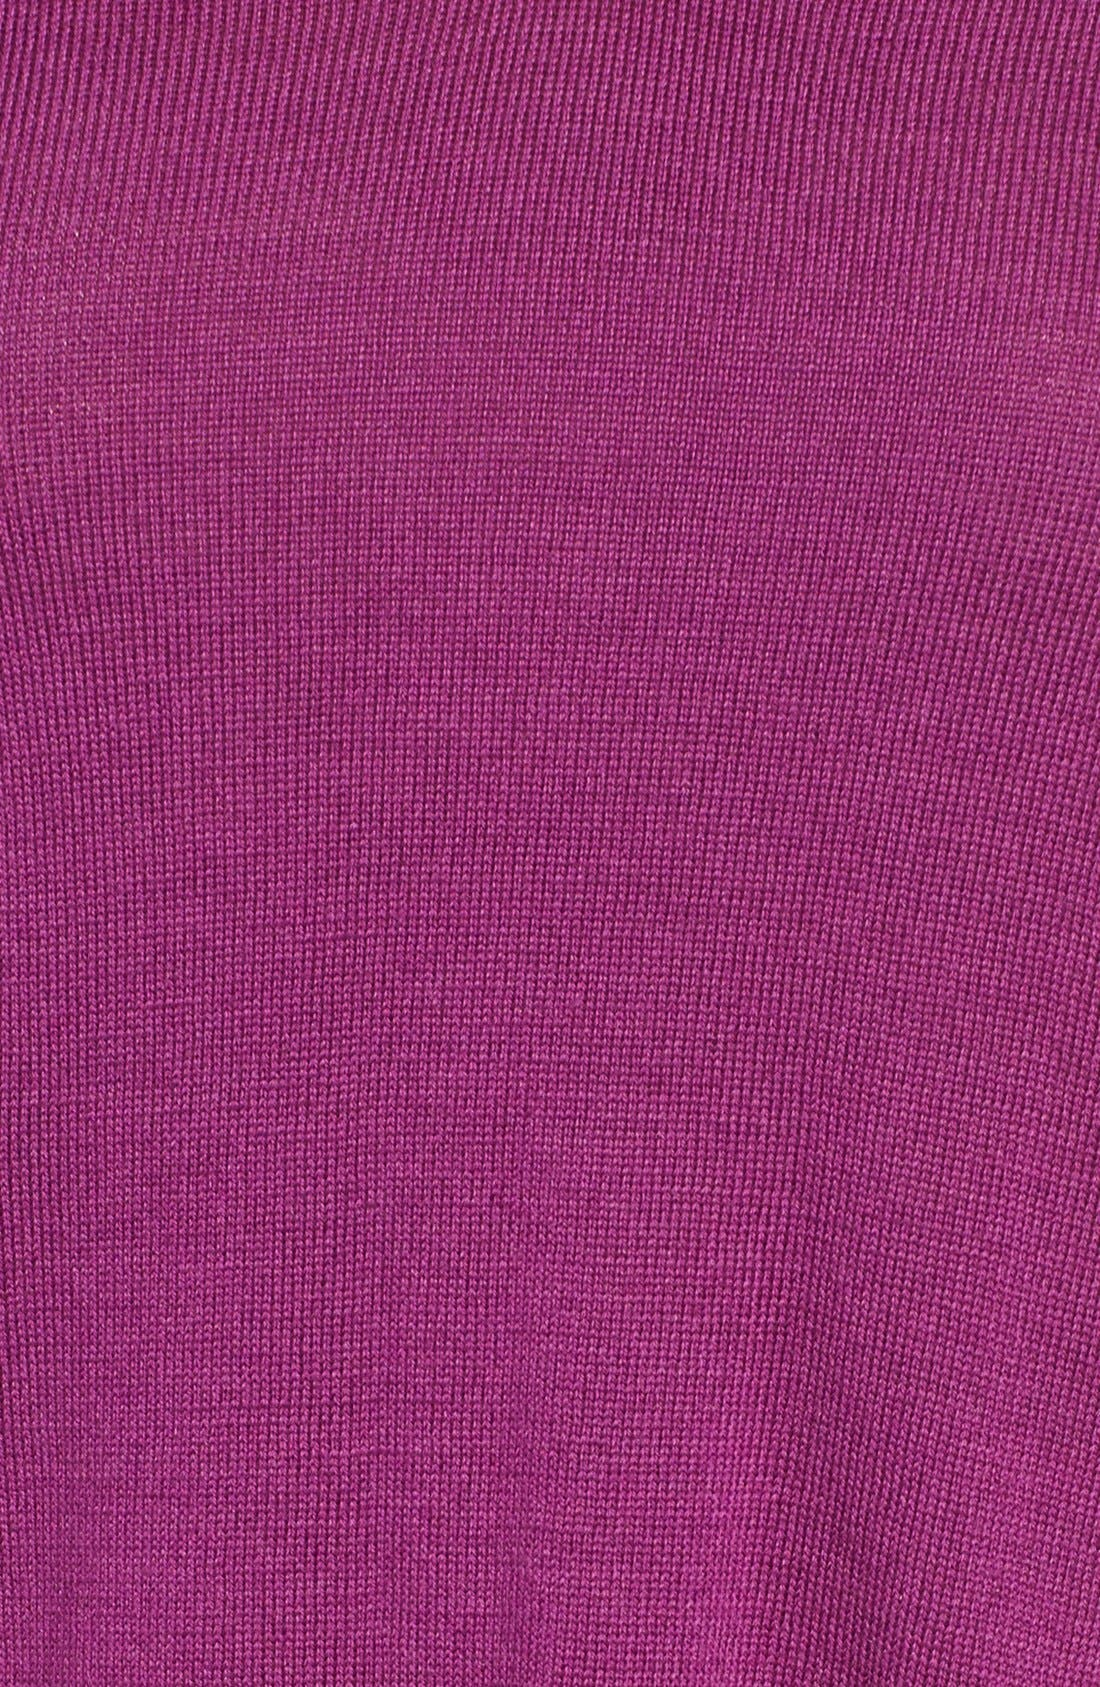 Lightweight Merino Jersey V-Neck Tunic,                             Alternate thumbnail 70, color,